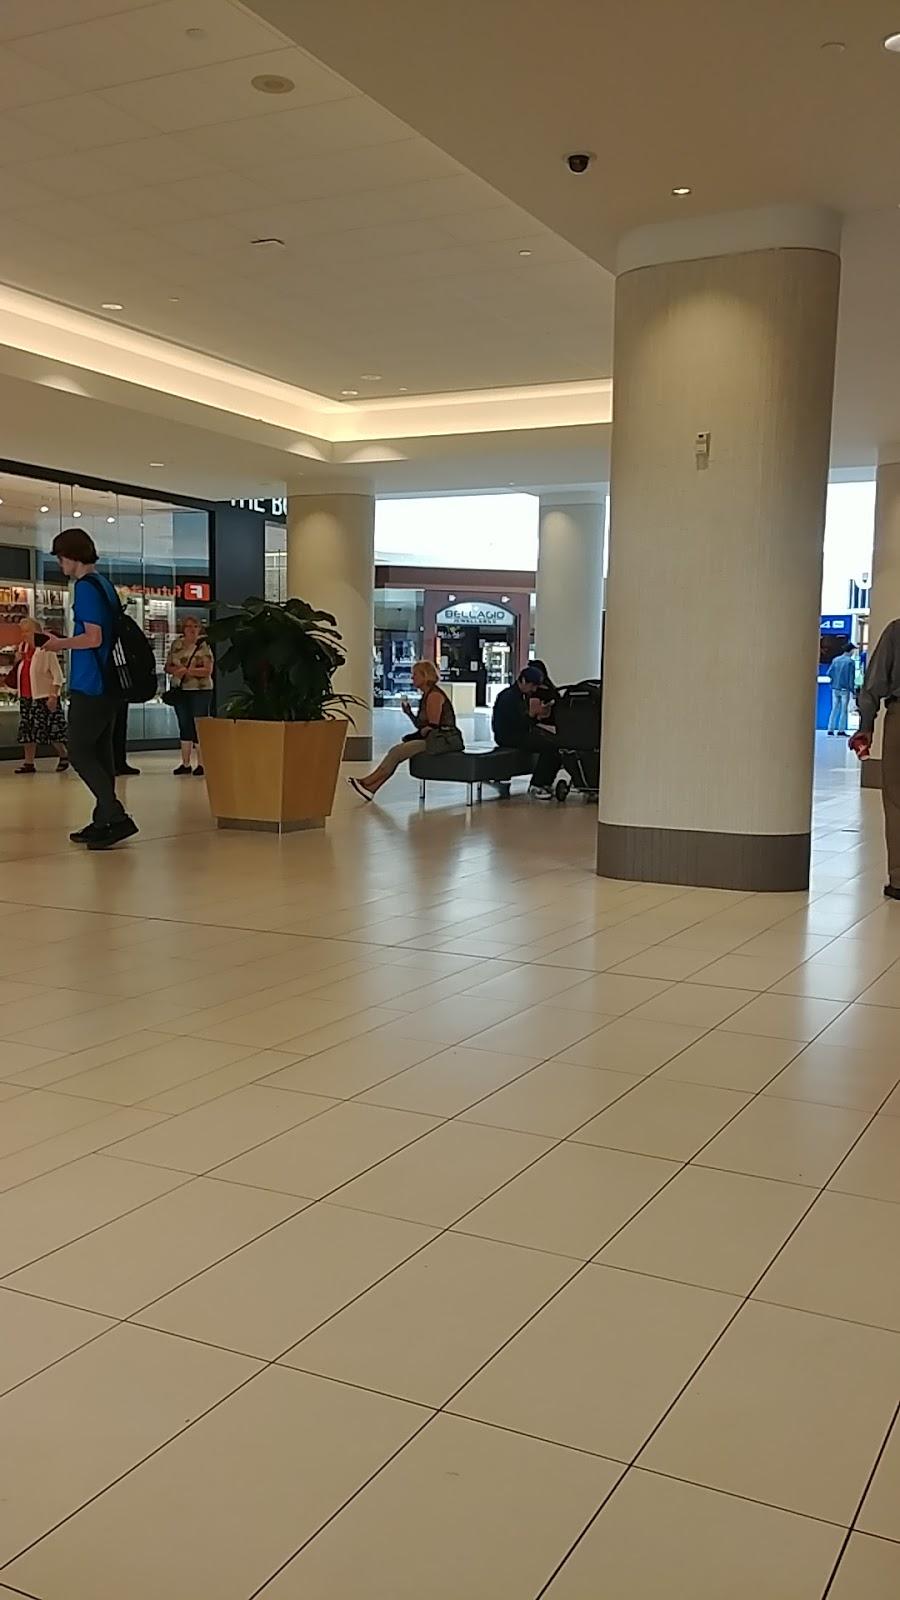 SmartCentres Oshawa South | shopping mall | 680 Laval Dr, Oshawa, ON L1J 0B5, Canada | 9057606200 OR +1 905-760-6200